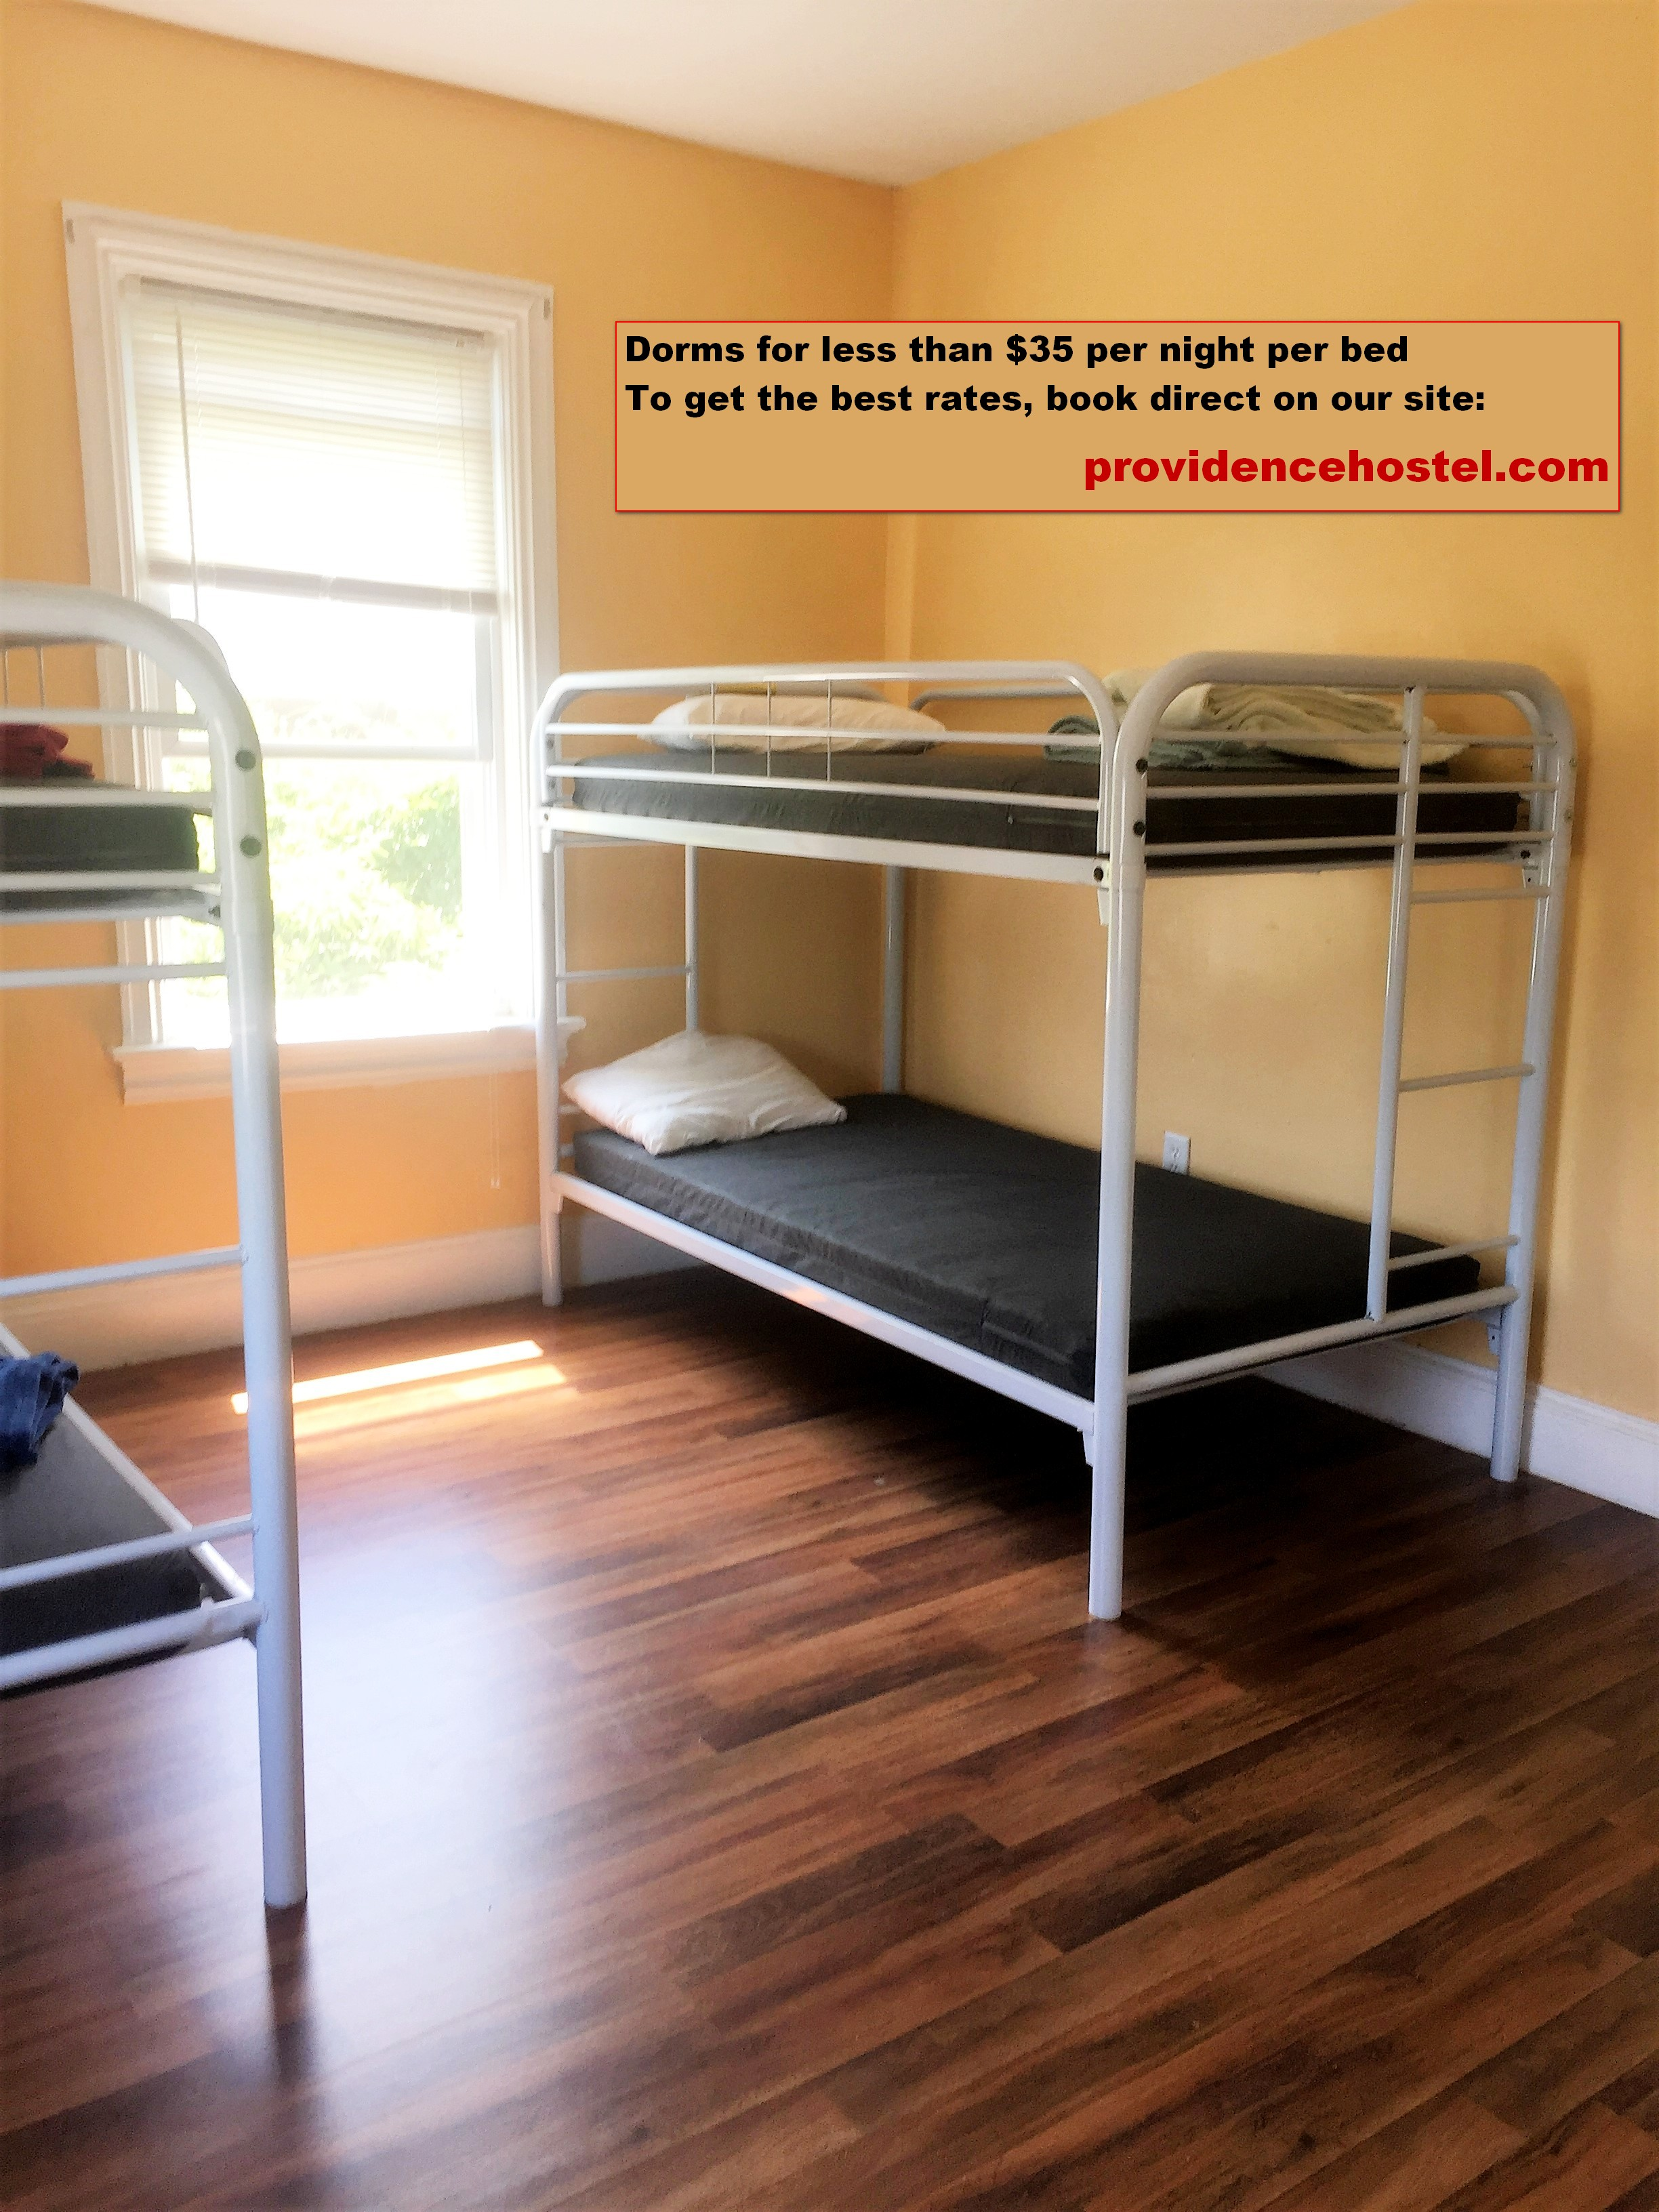 Cheap dorm rates